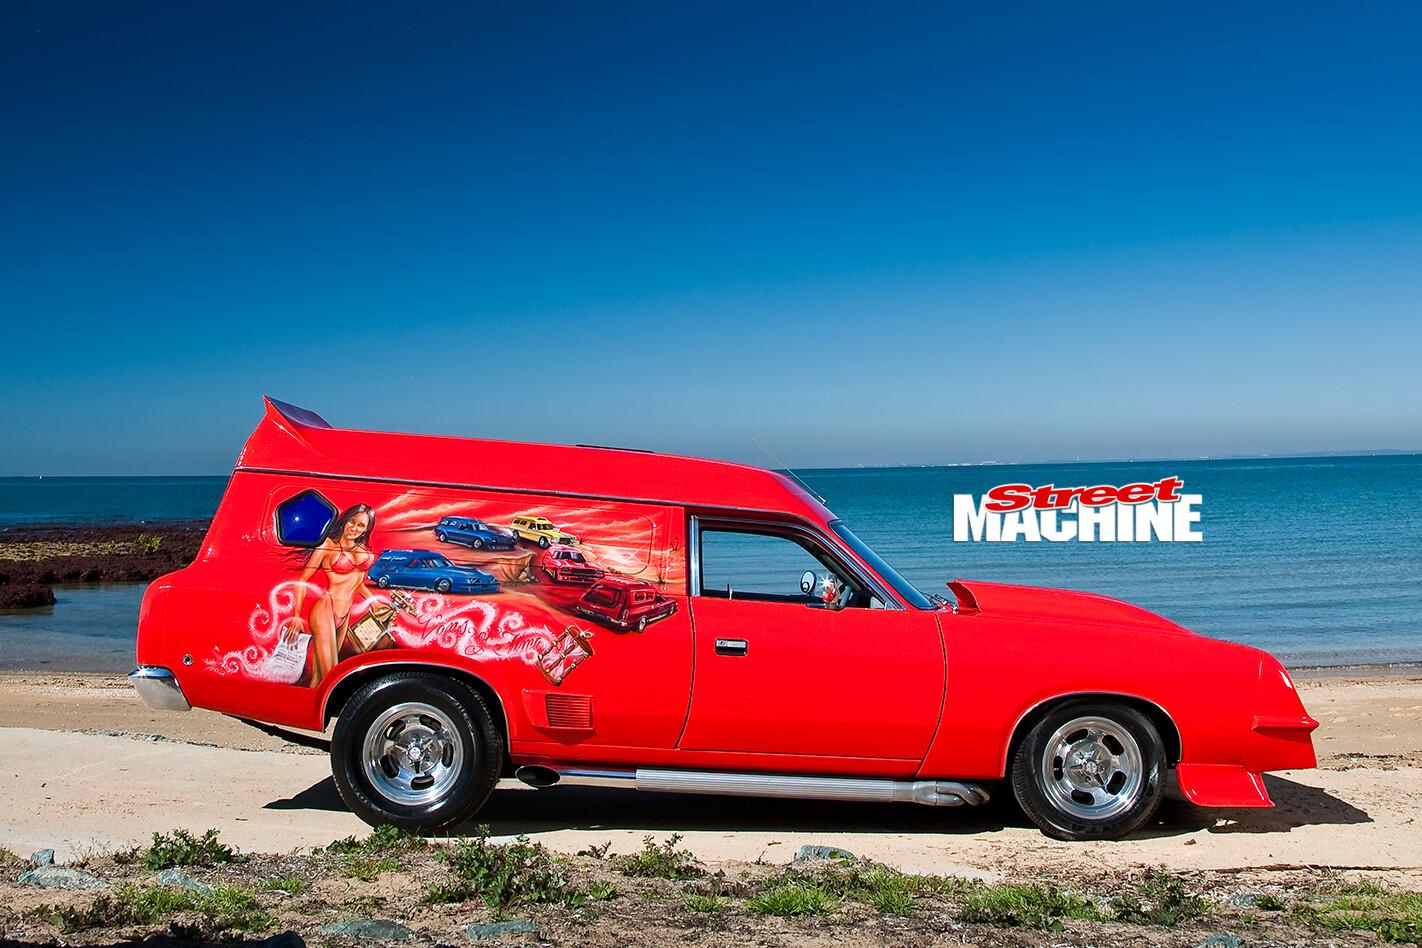 Chrysler -panel -van -side -view